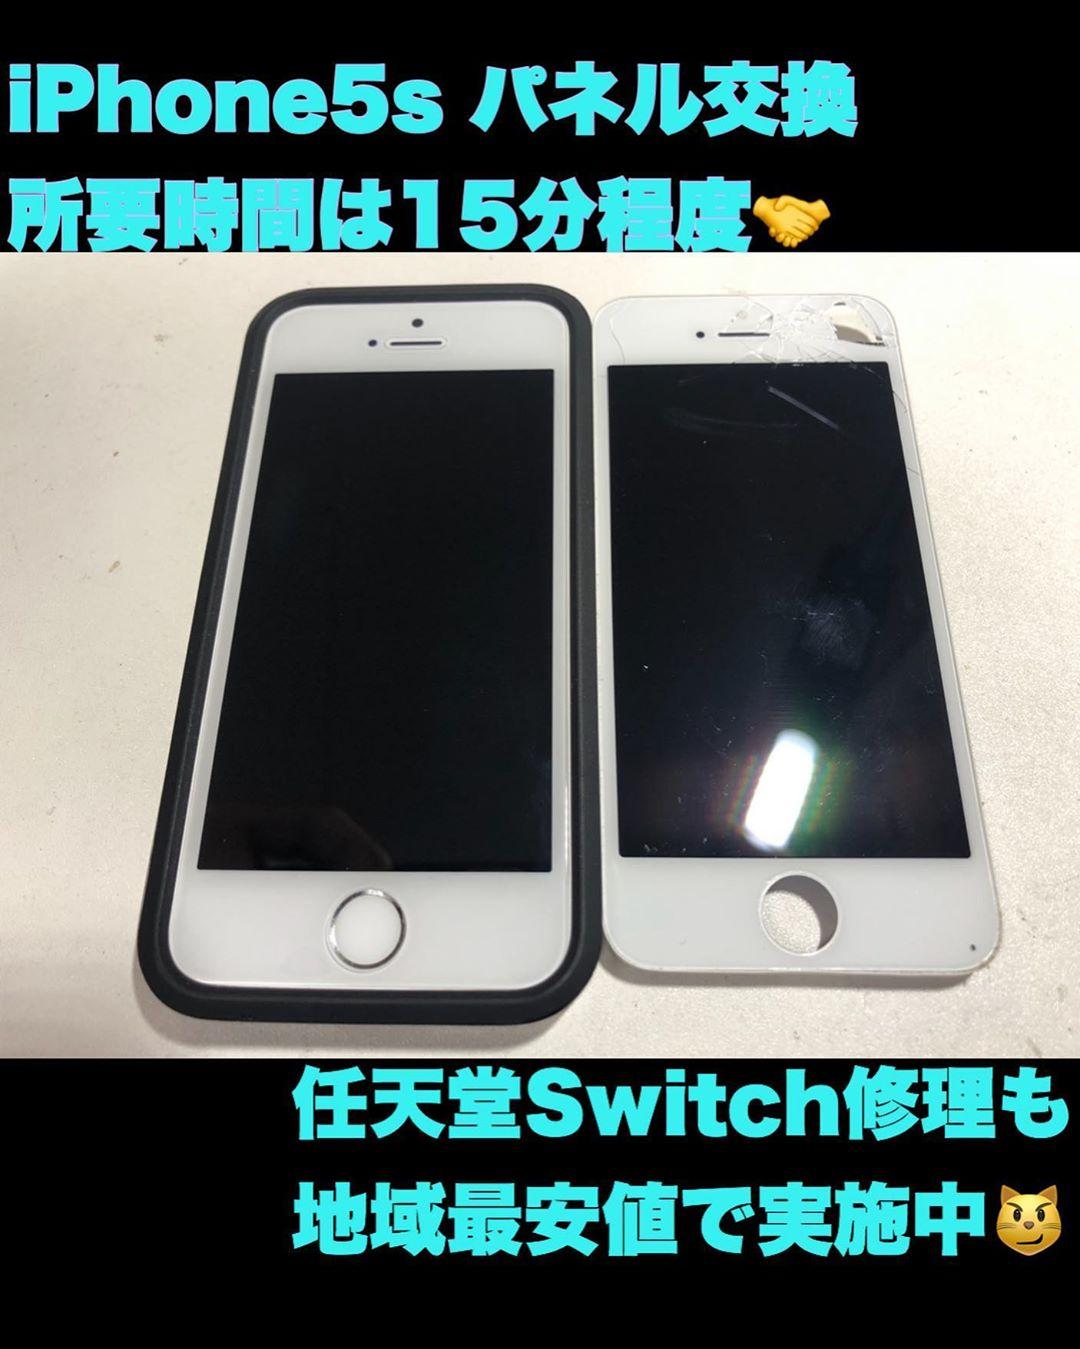 iPhone5S 画面割れ 交換 パネル交換 ヴィジョン江南駅前店 犬山市 小牧市 岩倉市